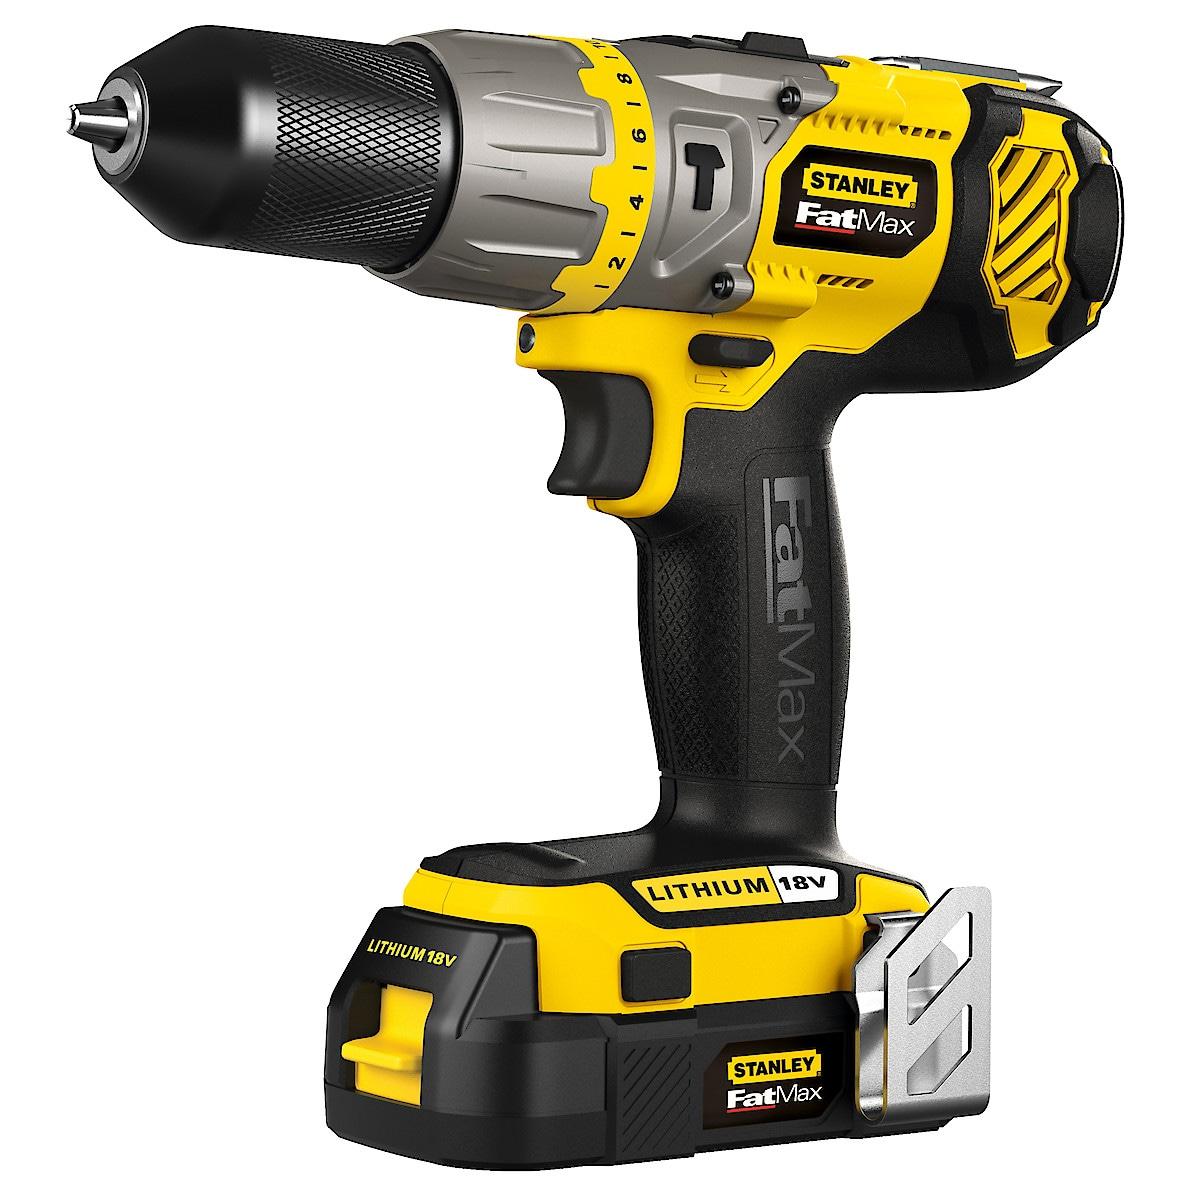 Stanley FatMax FMC620LB, 18 V drill